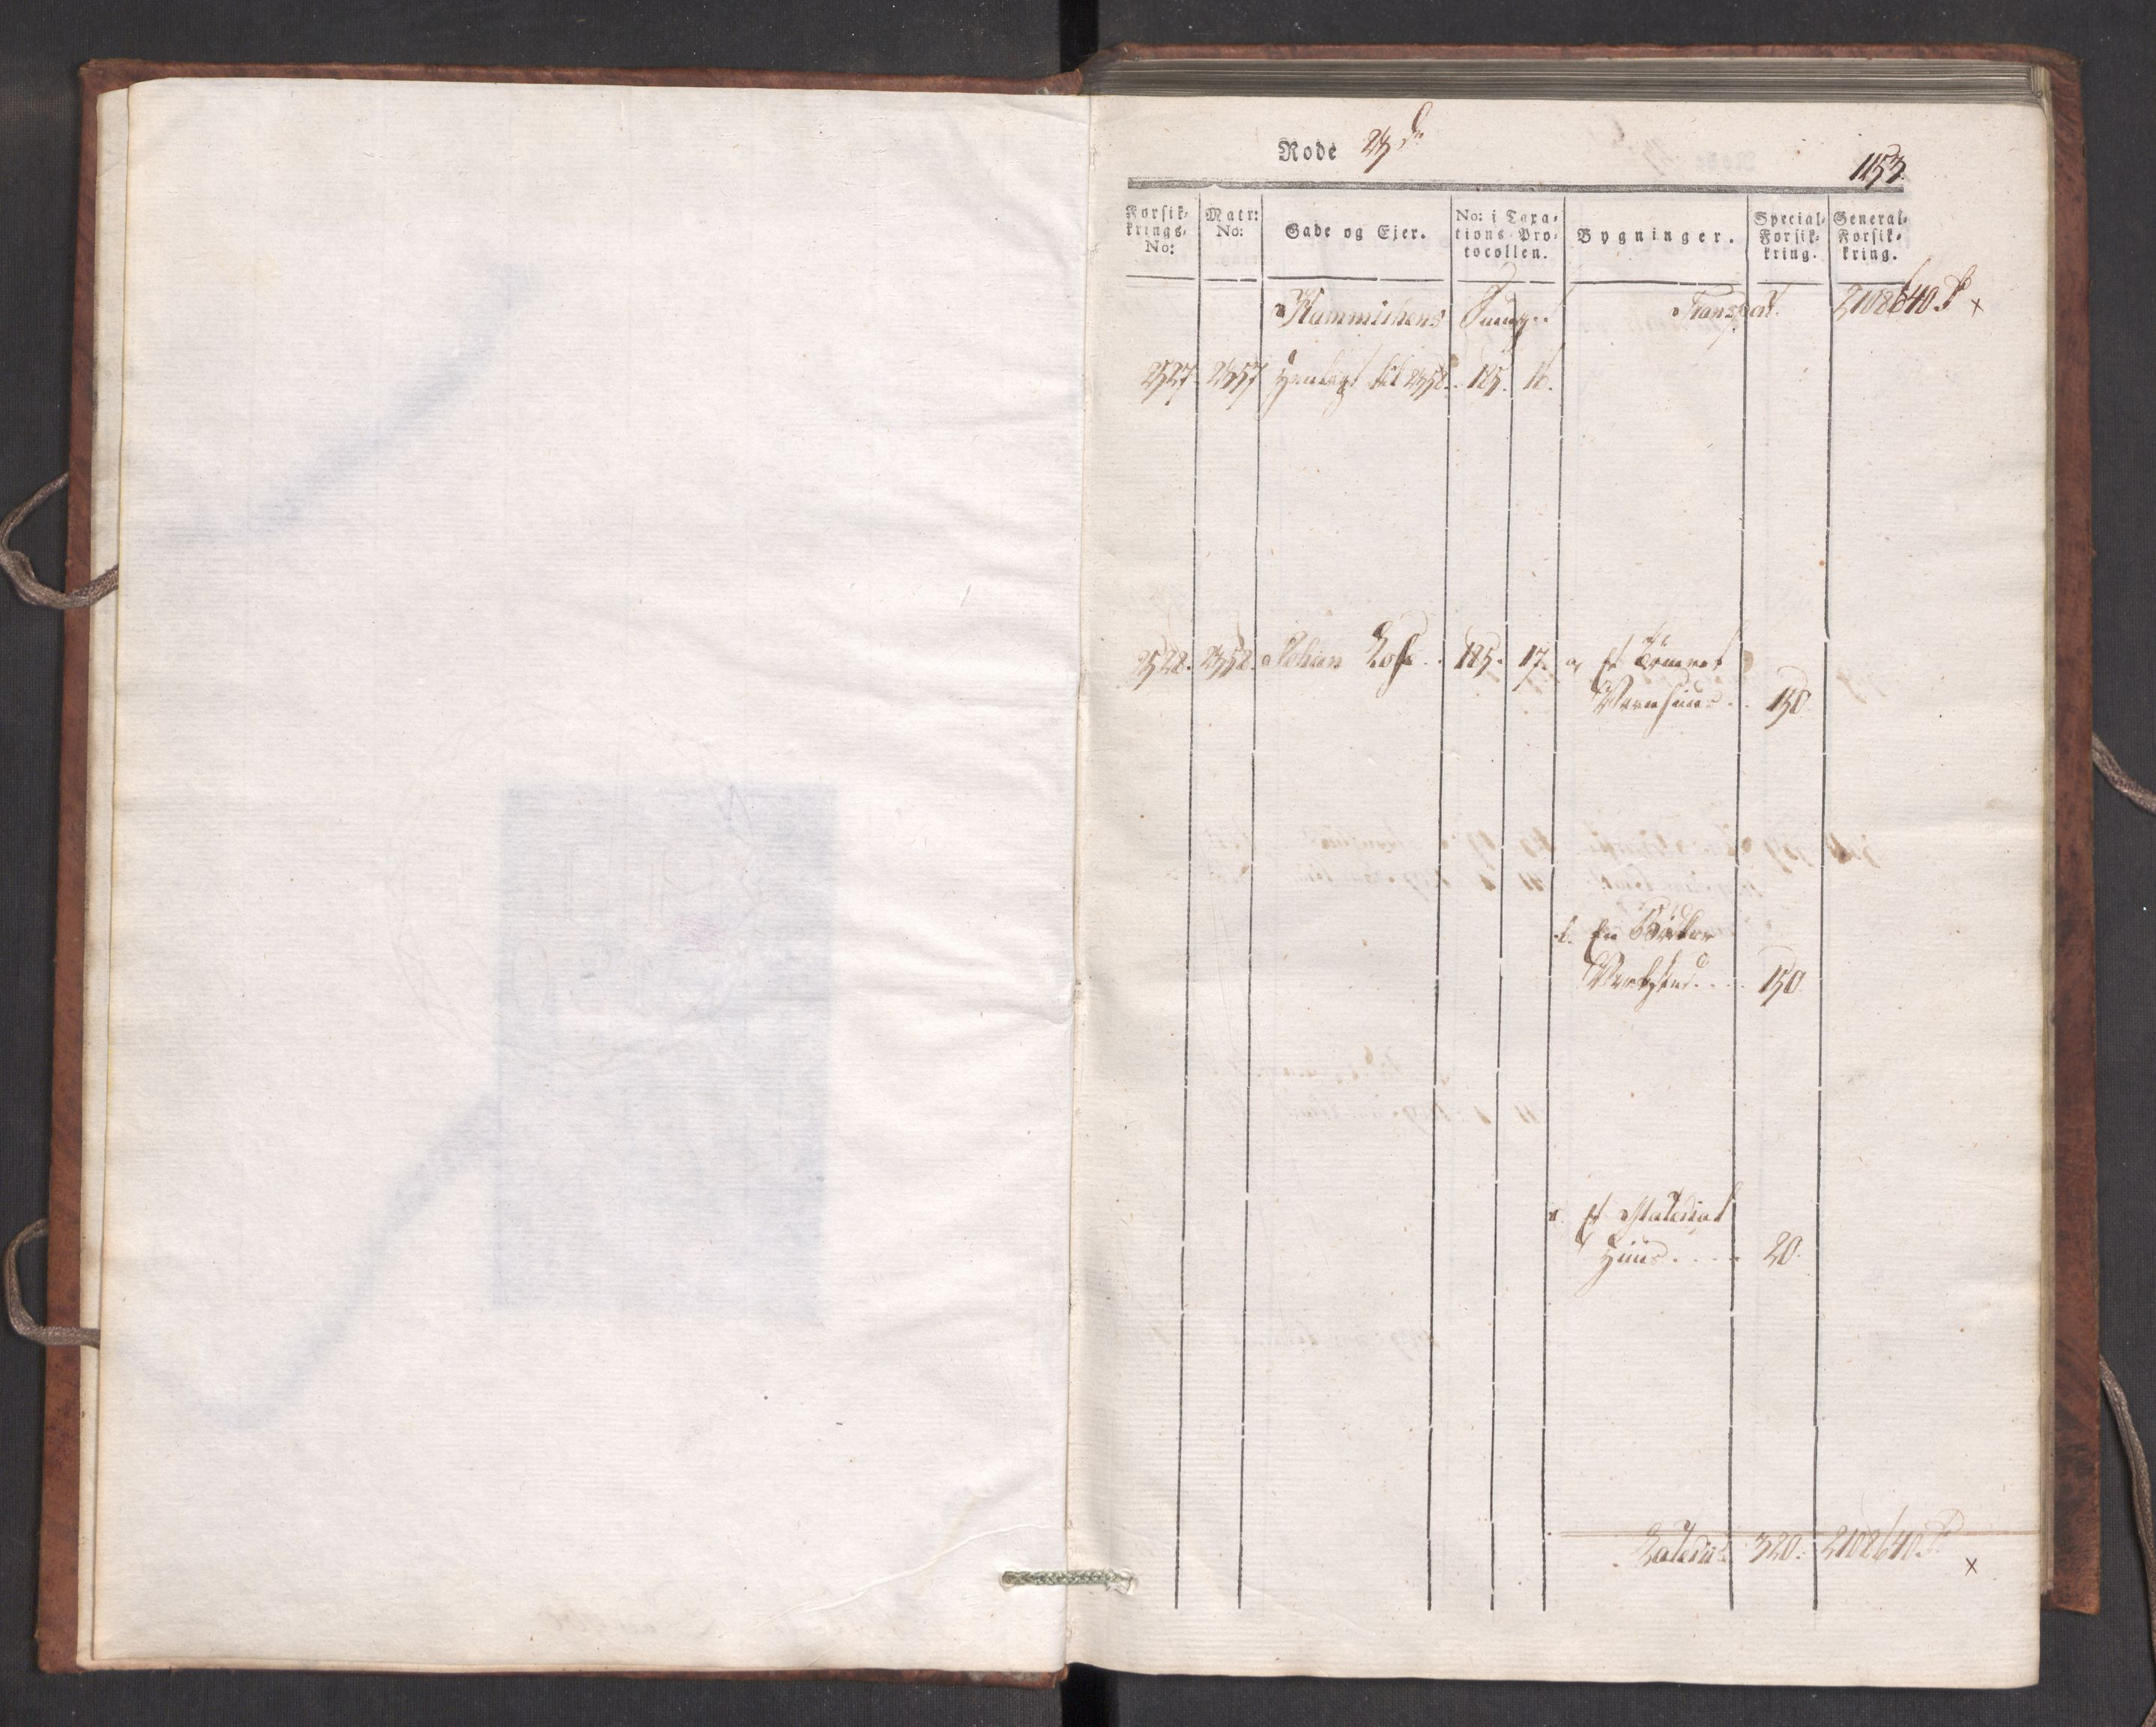 RA, Kommersekollegiet, Brannforsikringskontoret 1767-1814, F/Fa/L0007: Bergen, 1807-1817, p. 1153